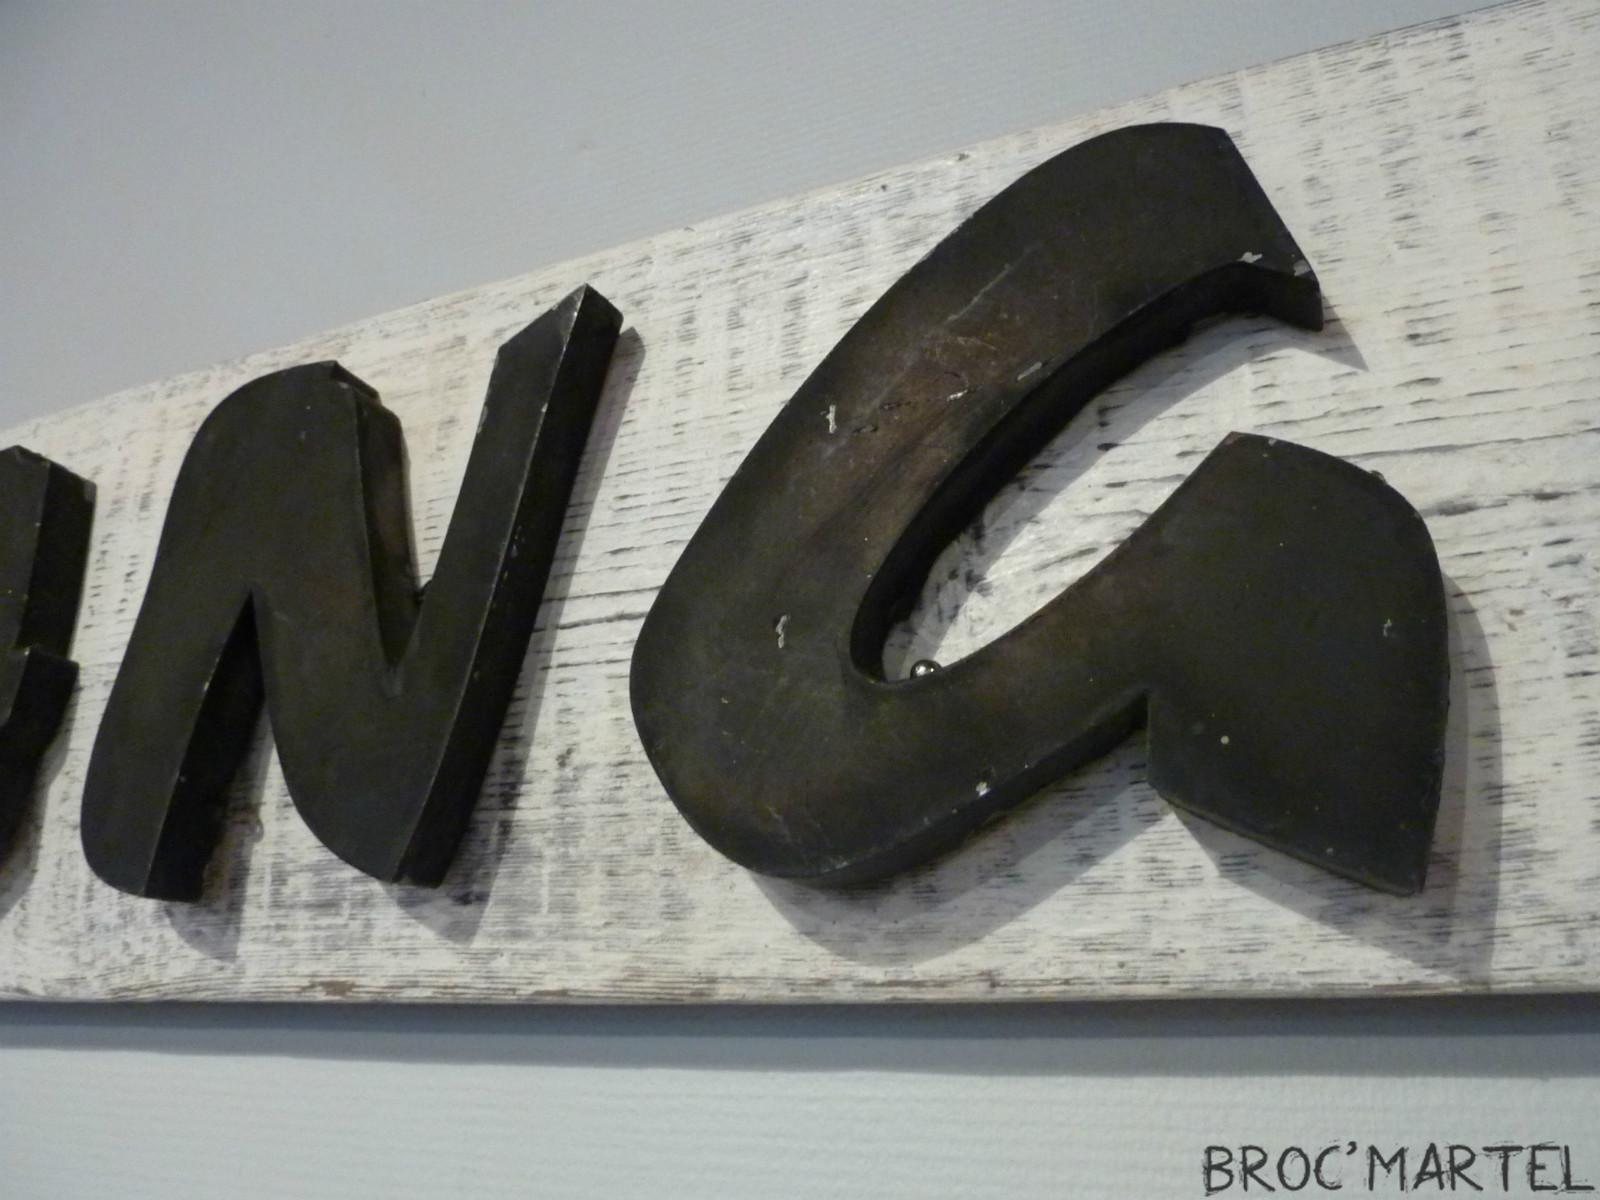 enseigne de magasin lettres en m tal vintage curiosit s boutique broc martel. Black Bedroom Furniture Sets. Home Design Ideas